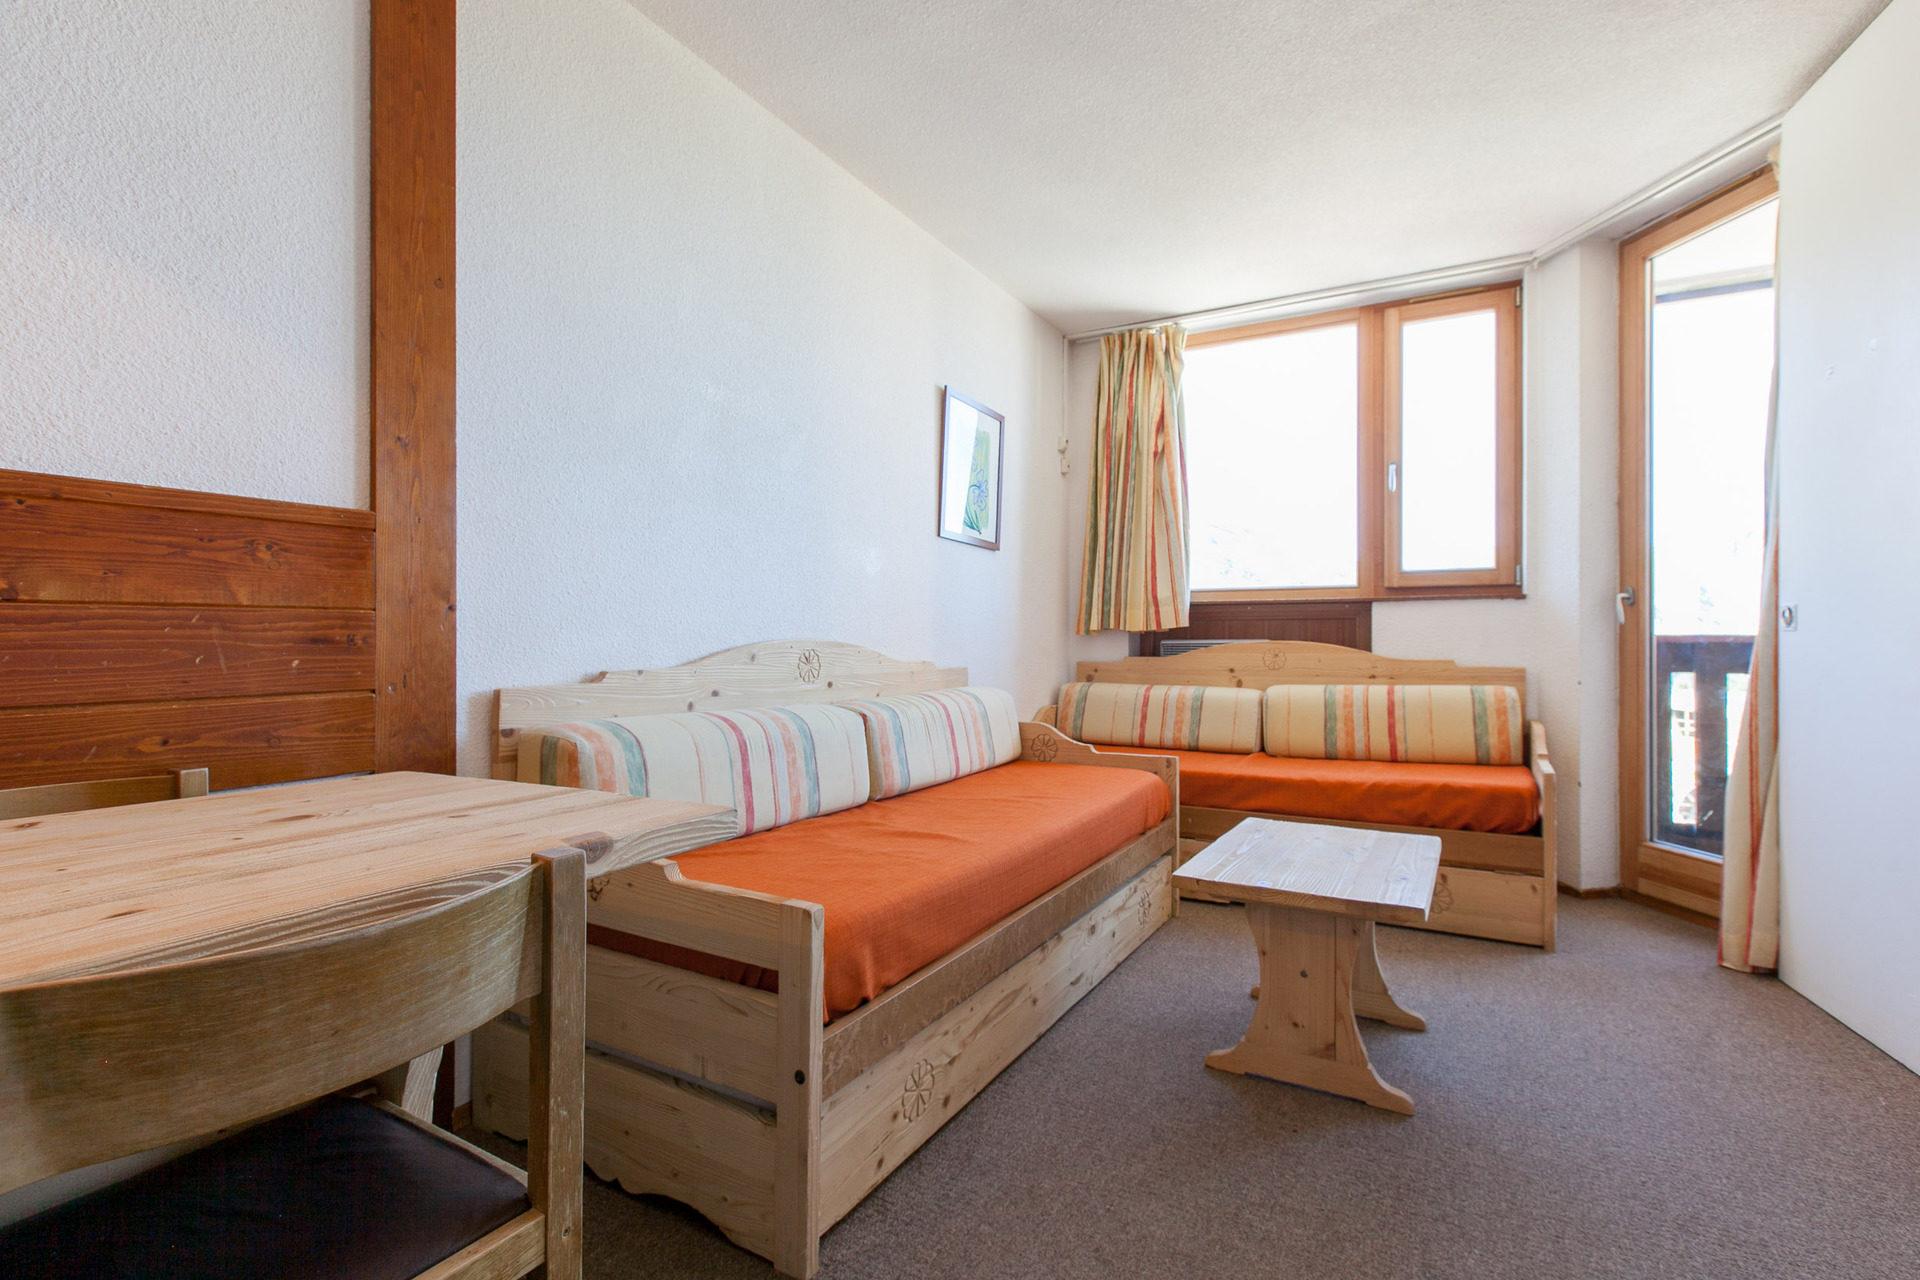 Rent a 2-rooms-(1-bedroom) at Avoriaz